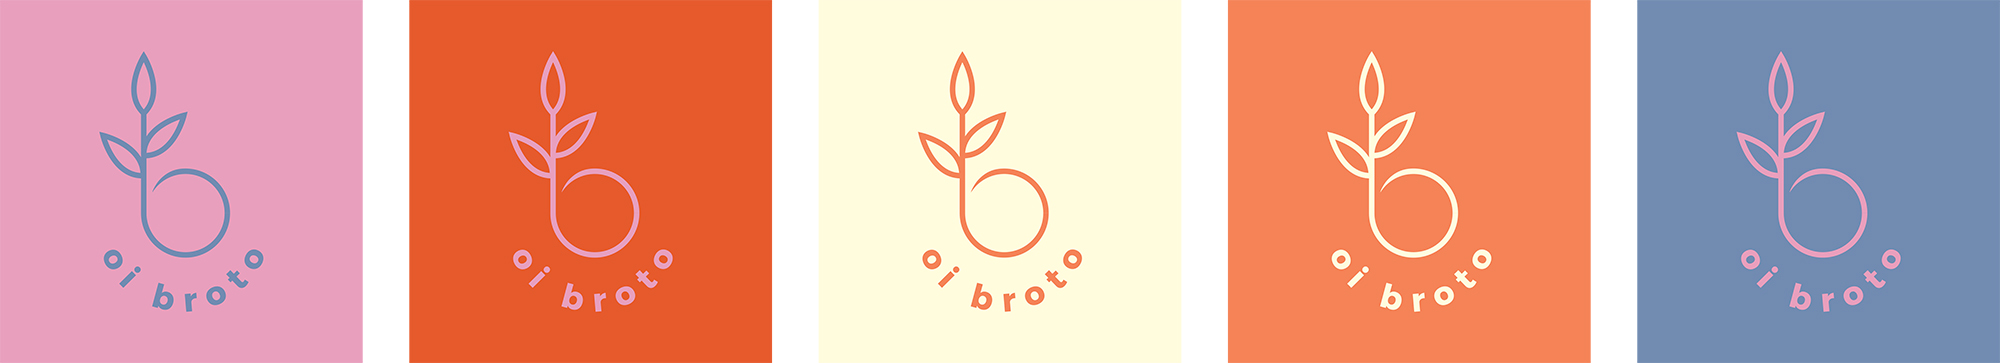 oi_broto_04-5 copy.jpg